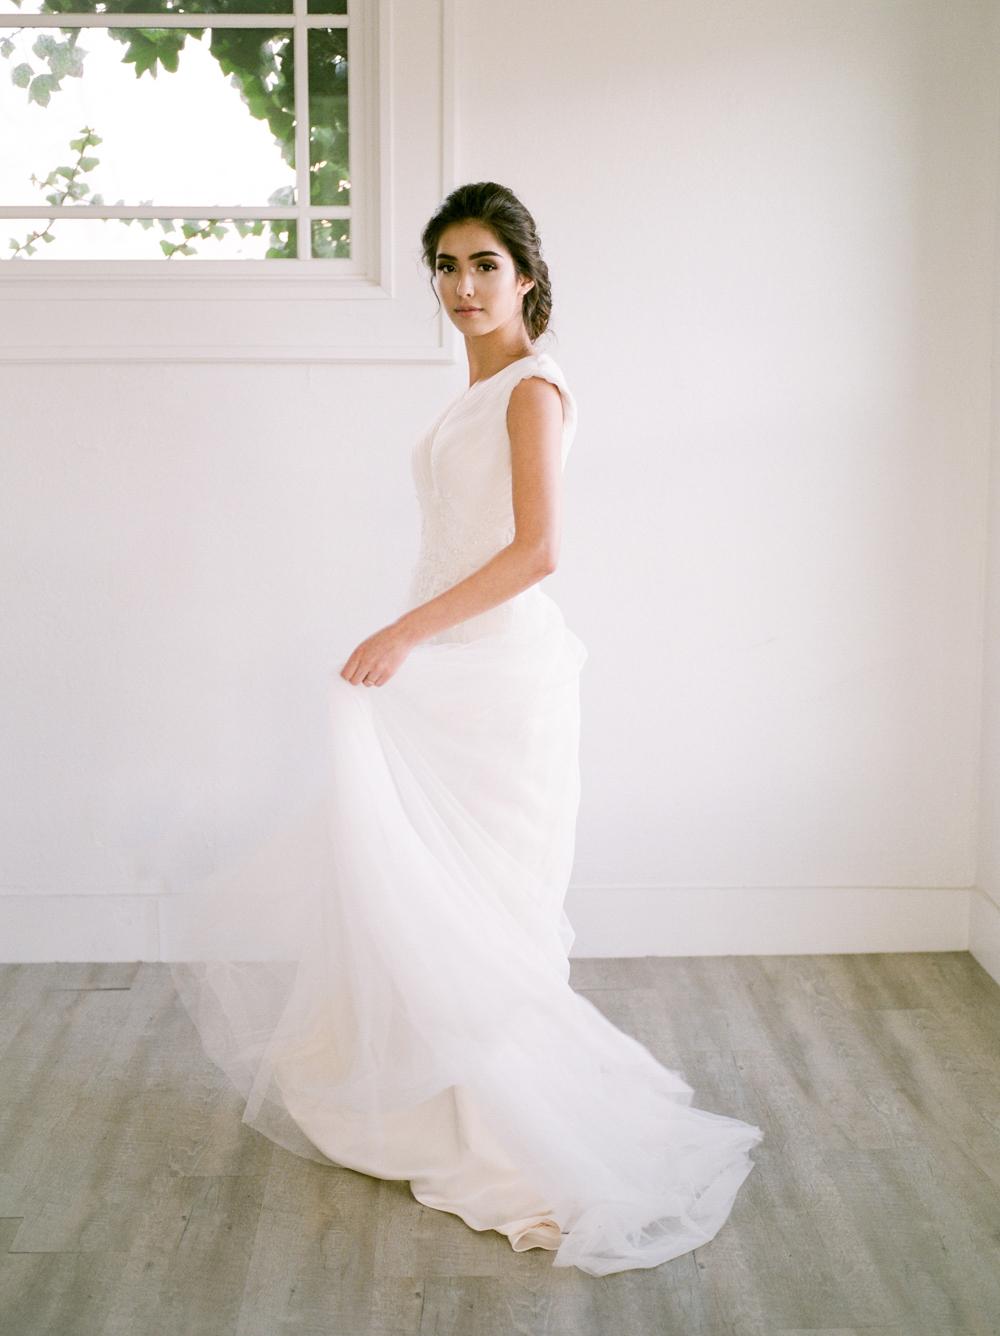 christine-gosch-utah-wedding-photographer-film-photographer-salt-lake-city-spring-utah-wedding-bridal-session-8.jpg